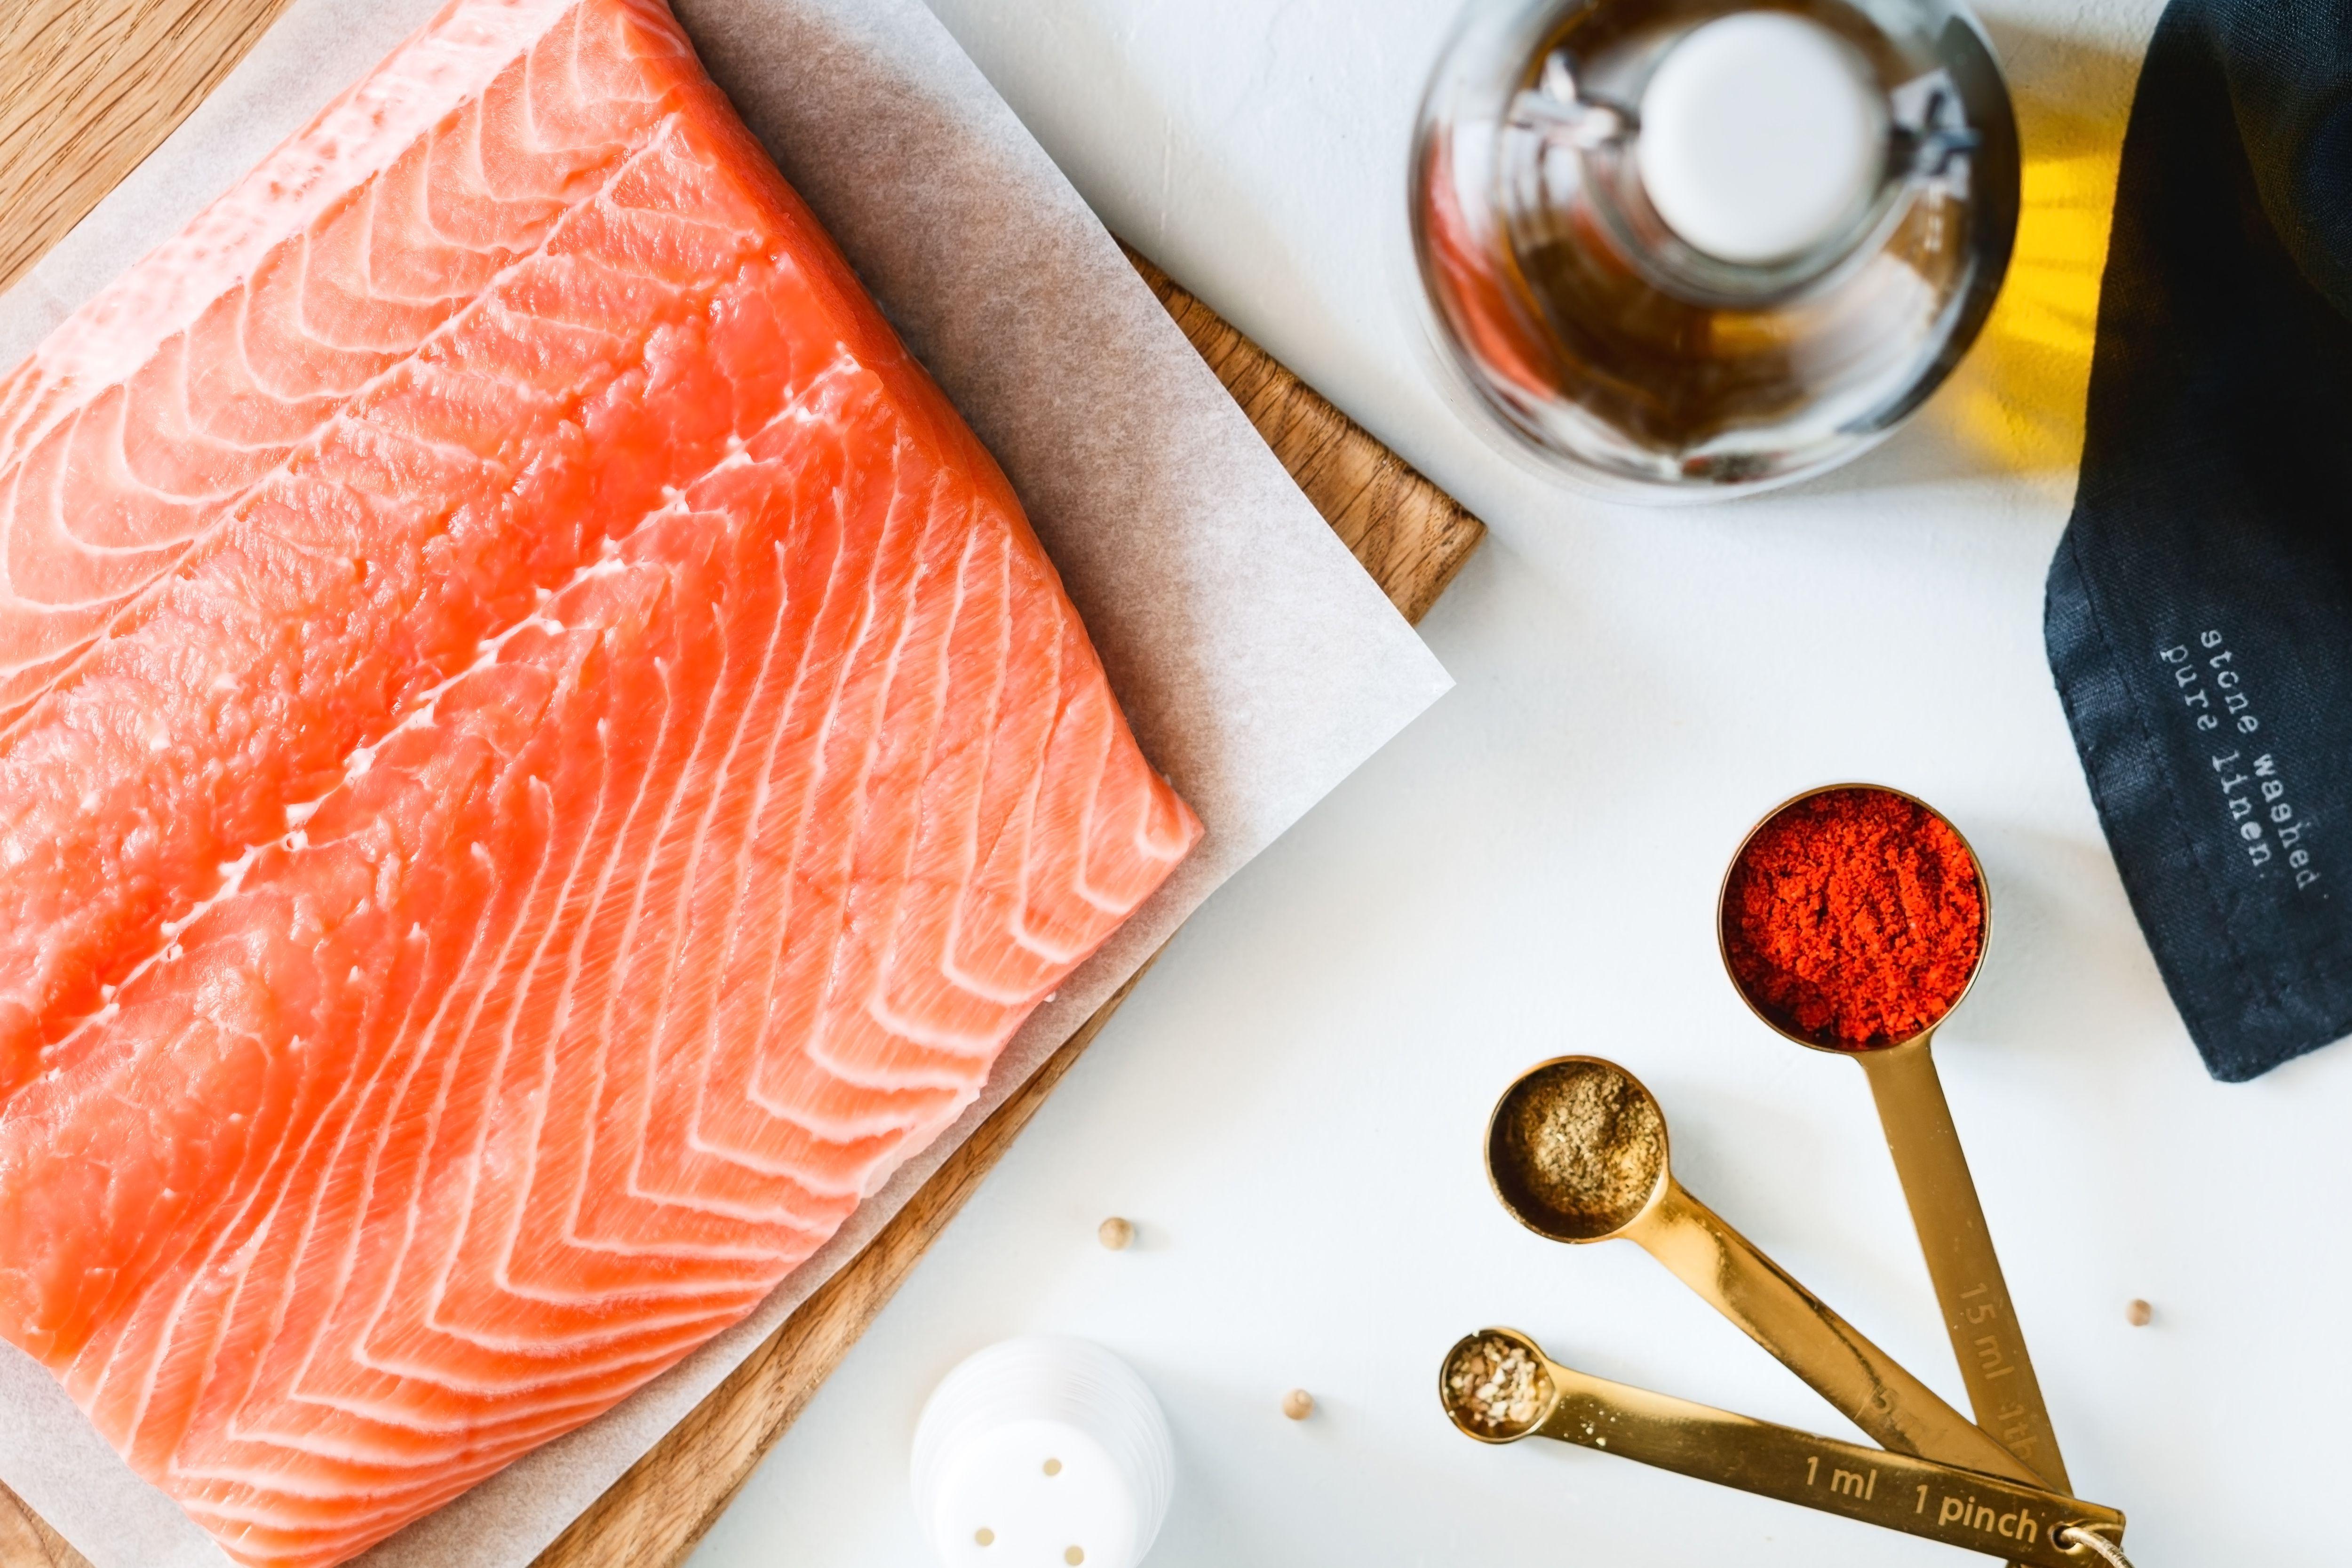 Roasted Salmon Fillets Recipe ingredients